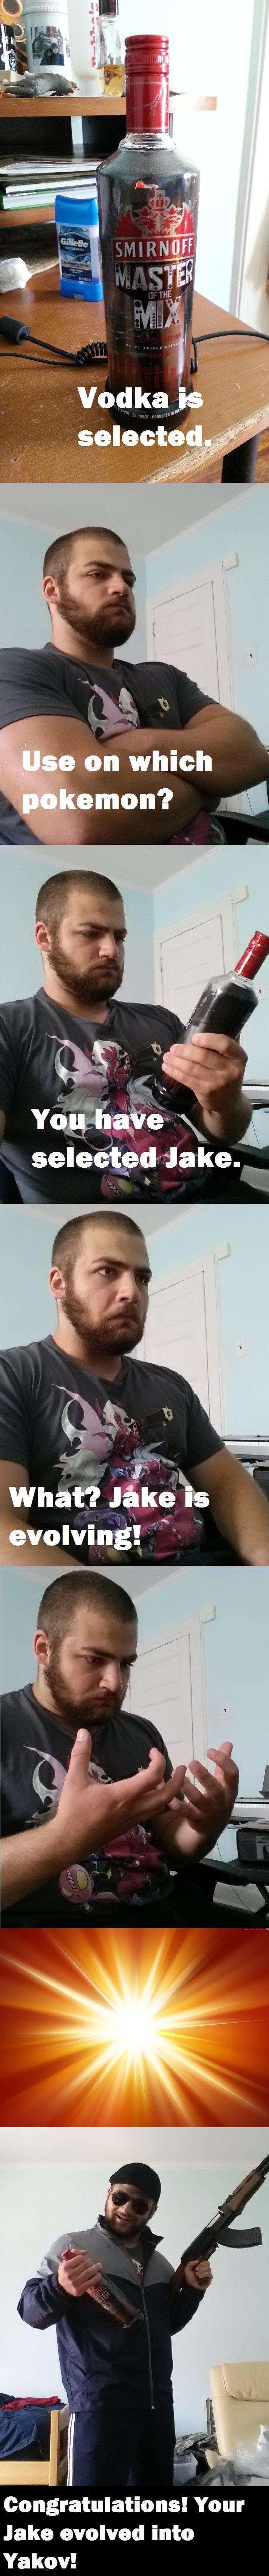 A Nu. cheeki breeki OC by me. I have no idea why I made this.. evolving! _ congratulations! Your Jake evolved into Yakov!. i have no idea why would anyone laugh to this i v damki